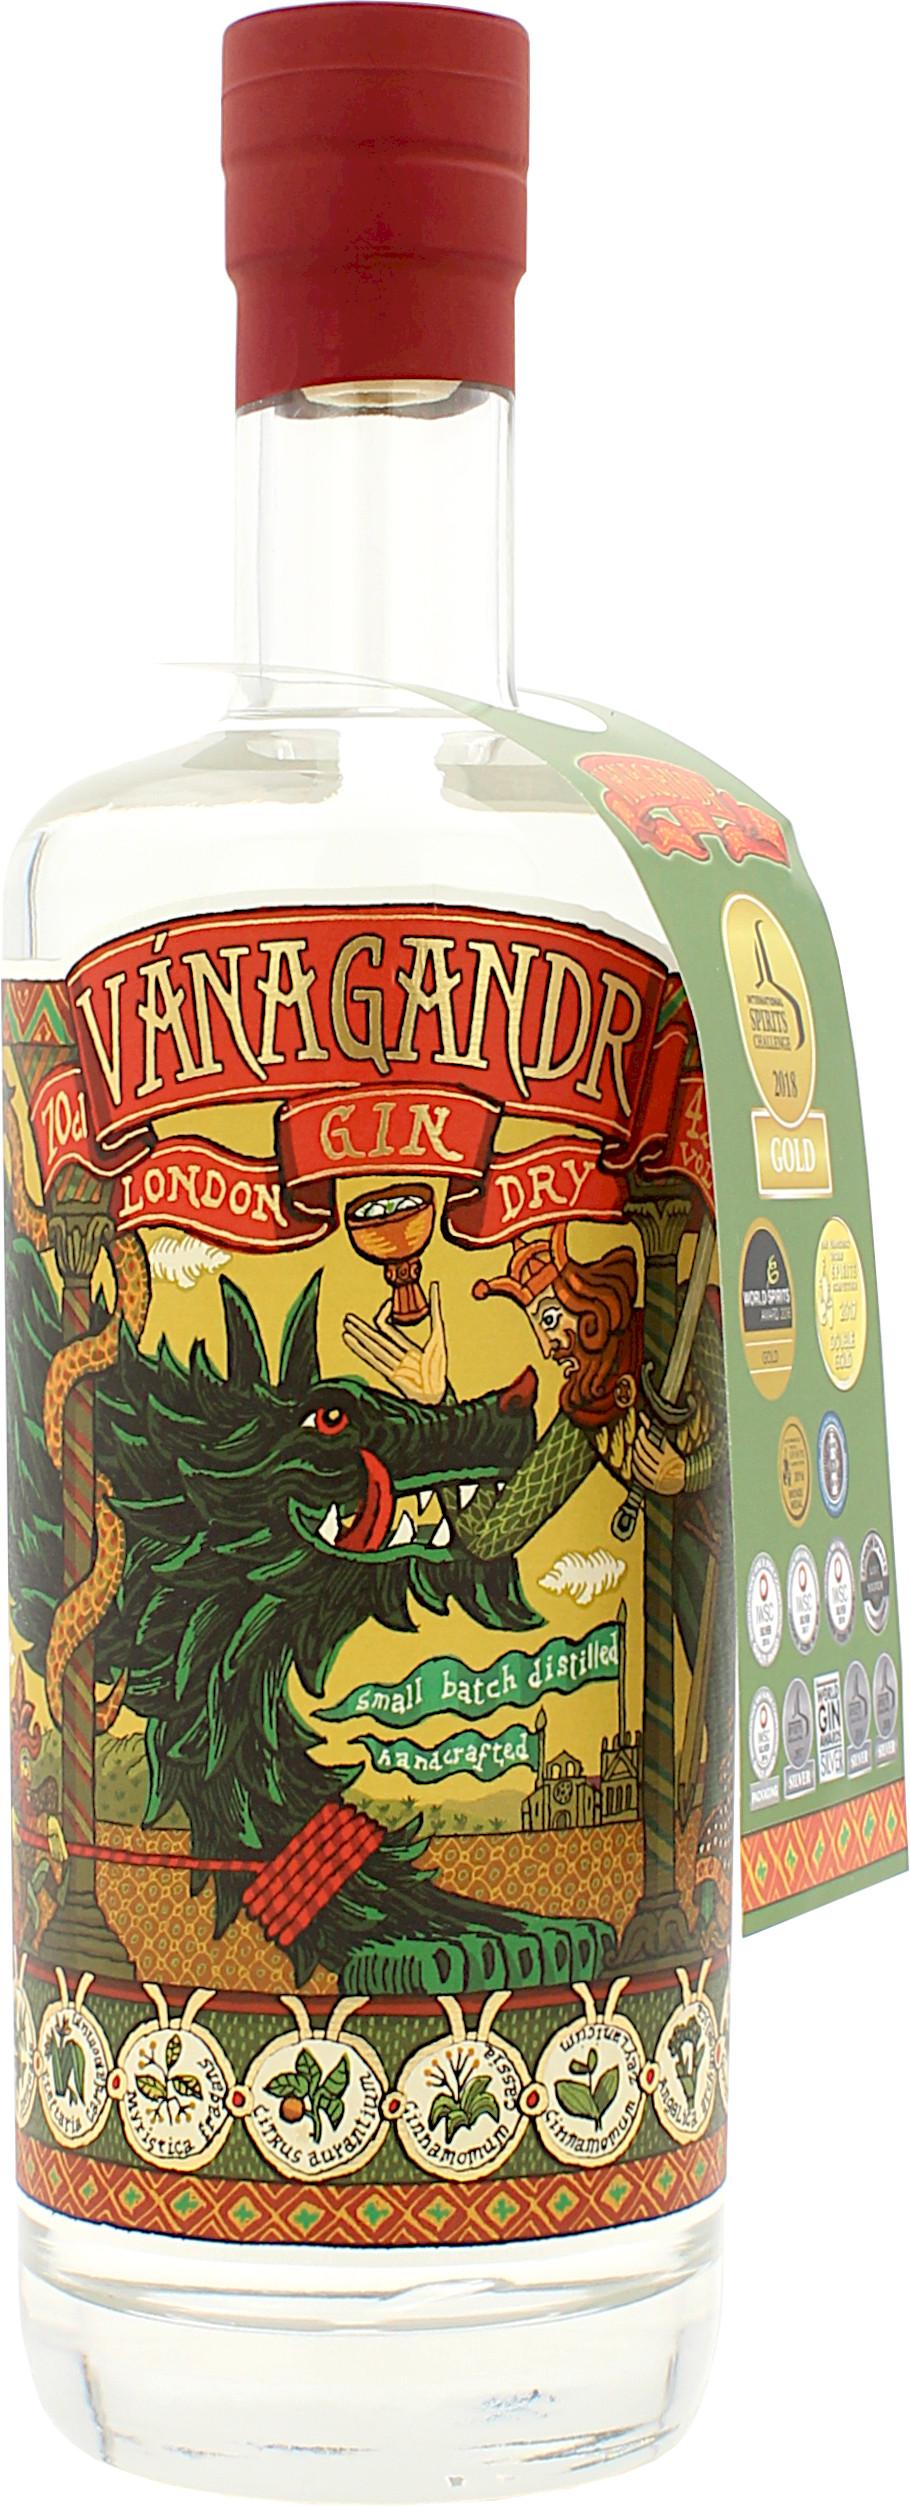 Vanagandr London Dry Gin 43.0% 0,7l